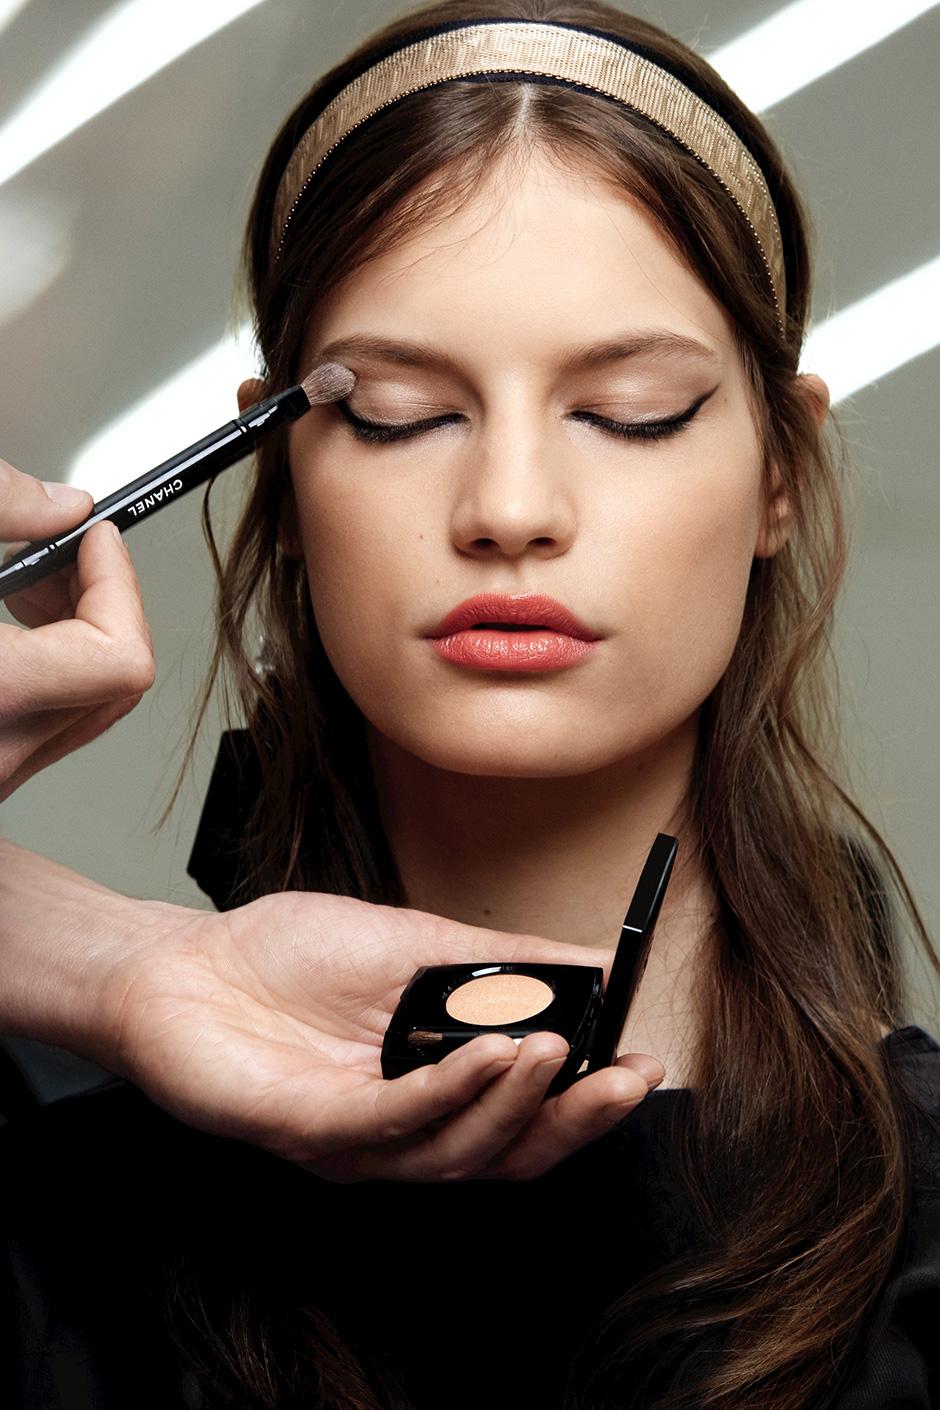 Chanel Makeup Brushes: CHANEL Cruise 2017-18 Paris Show Backstage Makeup